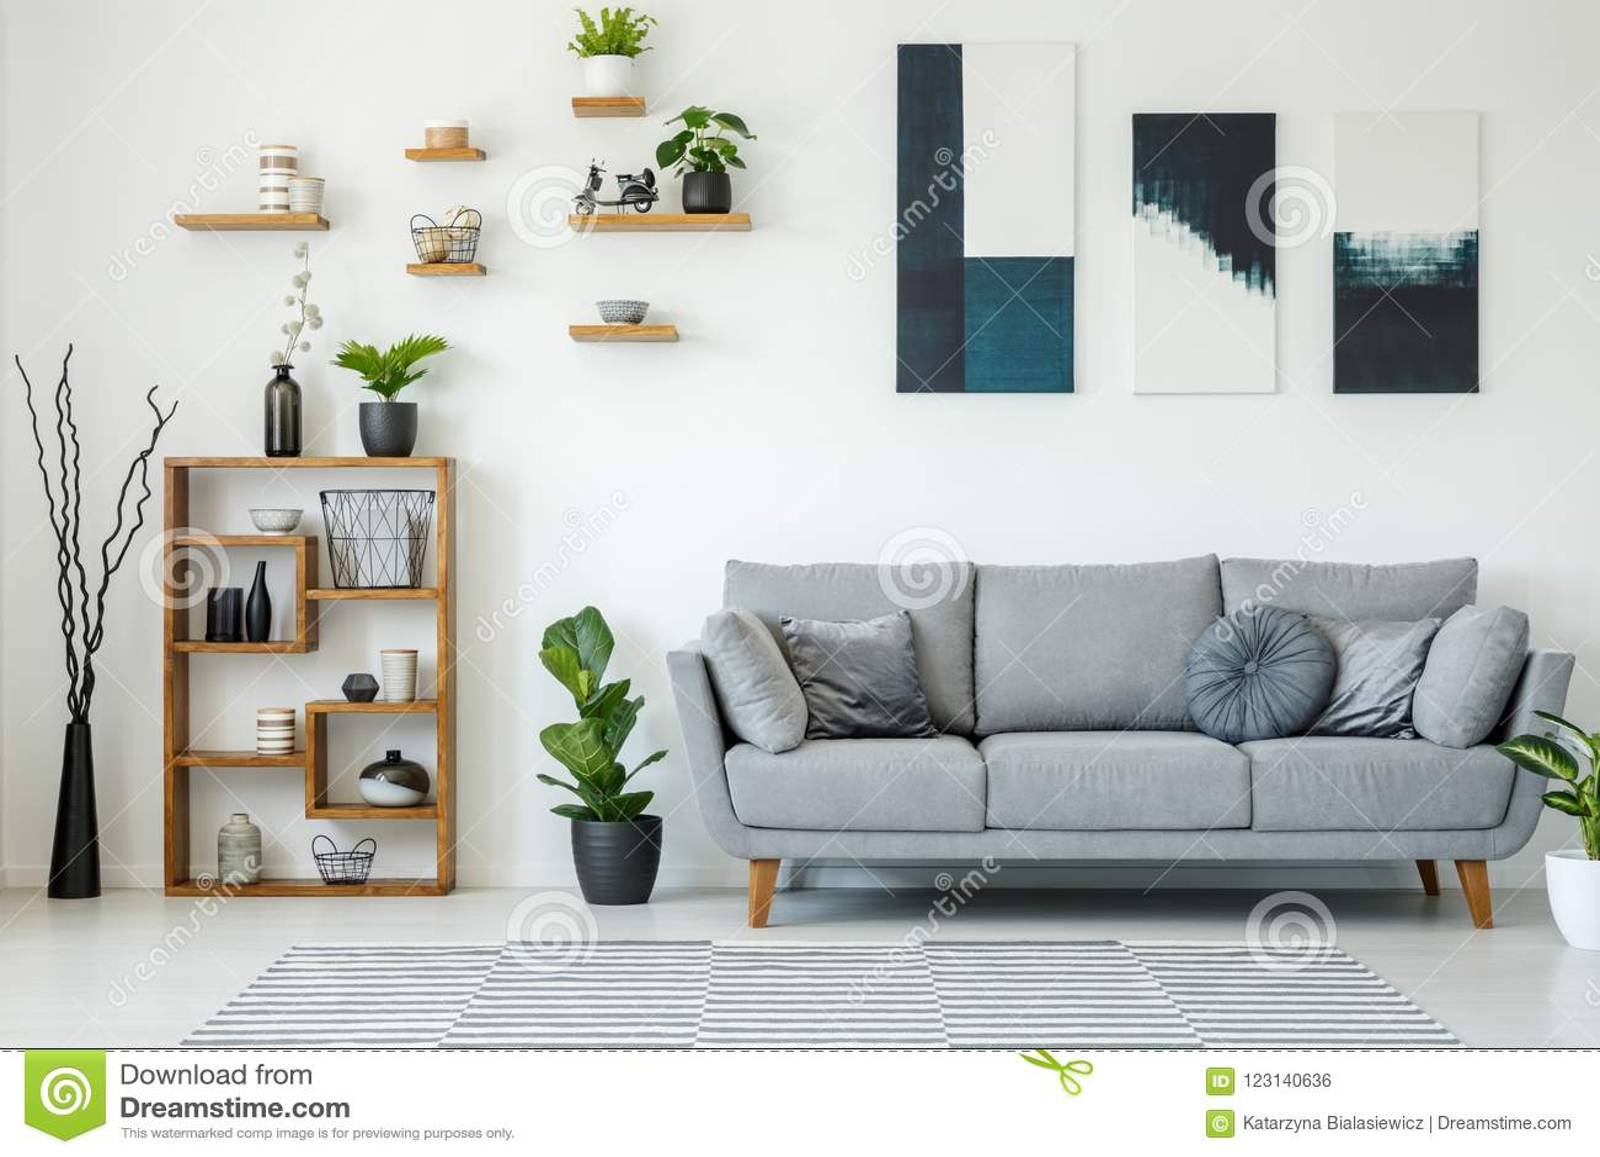 Elegant Living Room Interior With A Grey Sofa Wooden Shelves P